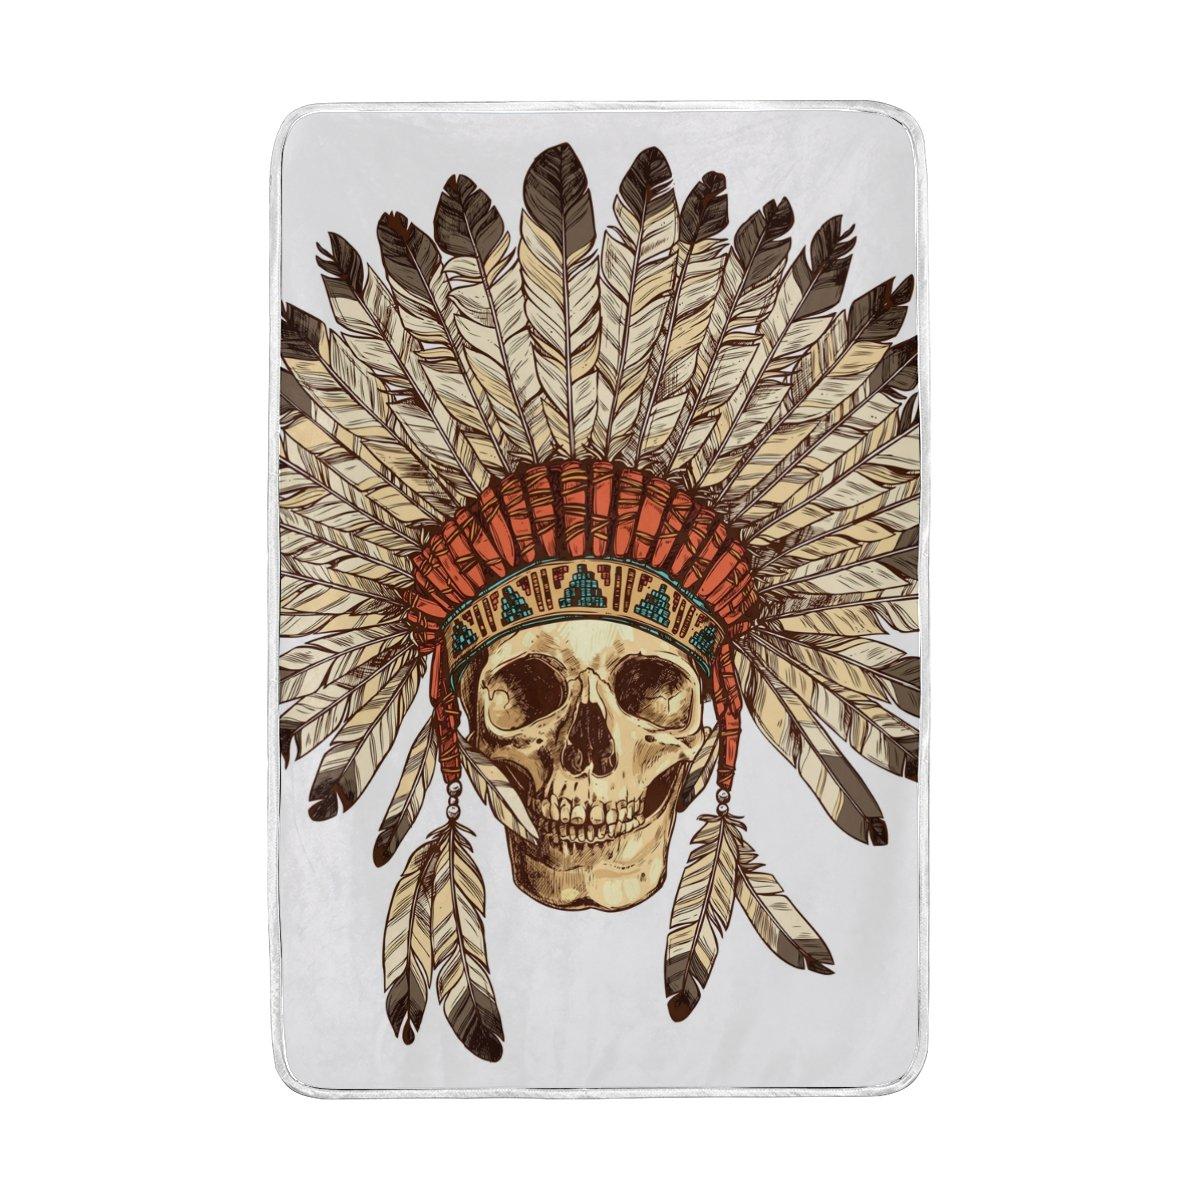 Alaza Headdress with Human Skull Blanket Luxury Throw PersonalizedスタイリッシュFuzzyソフト暖かい軽量毛布ベッド用Counch All Seasonユニセックス大人用メンズレディース男の子女の子60 x 90インチ B076J7GPB9